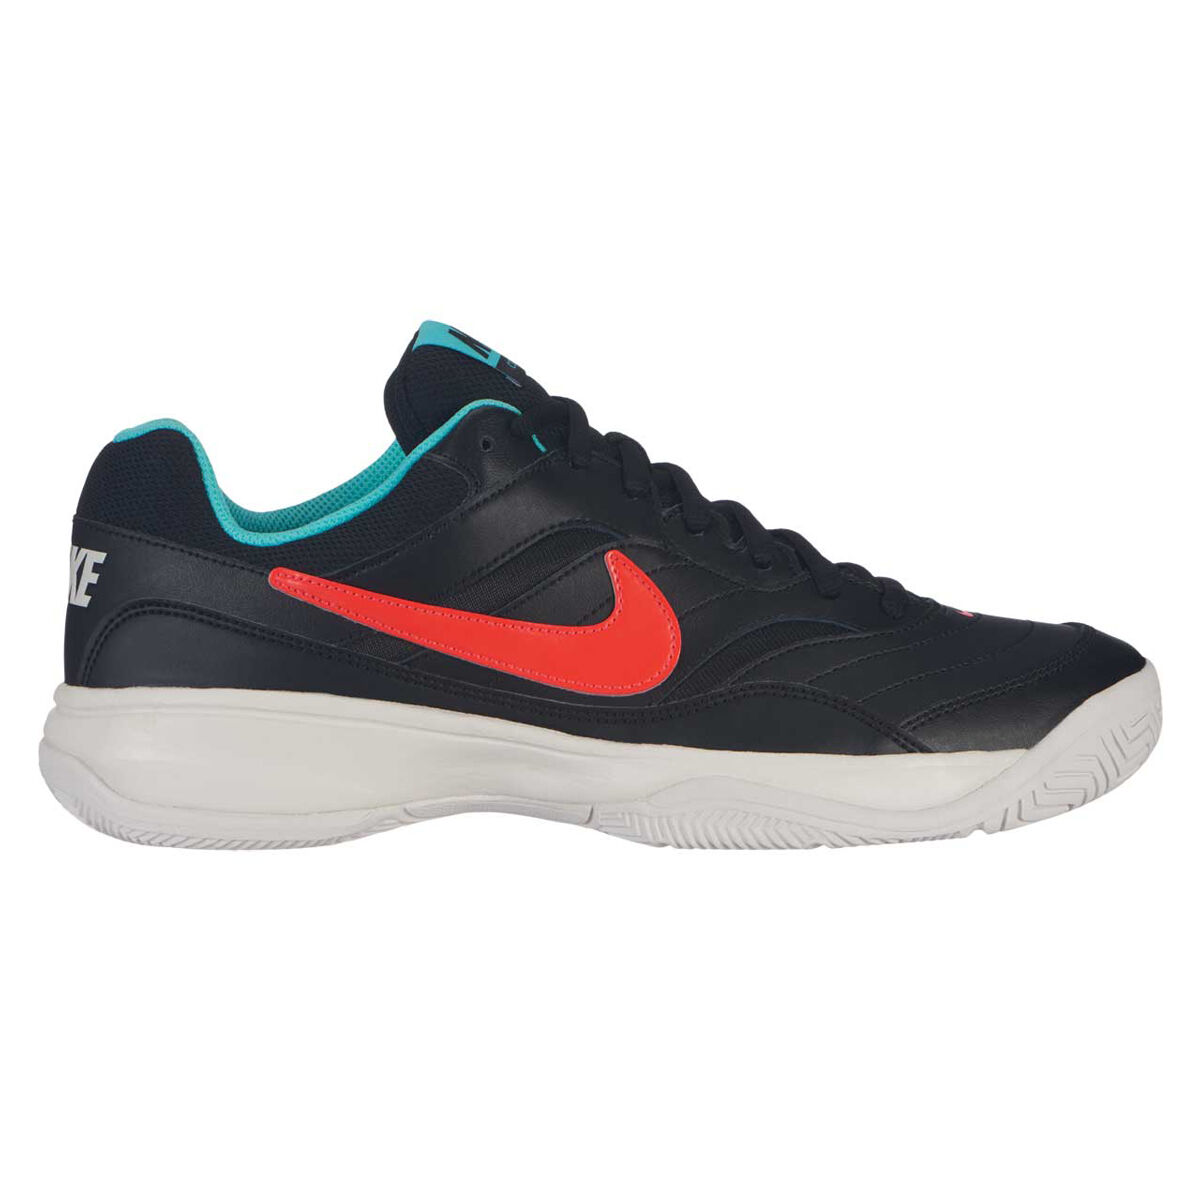 Nike Court Lite Mens Tennis Shoes